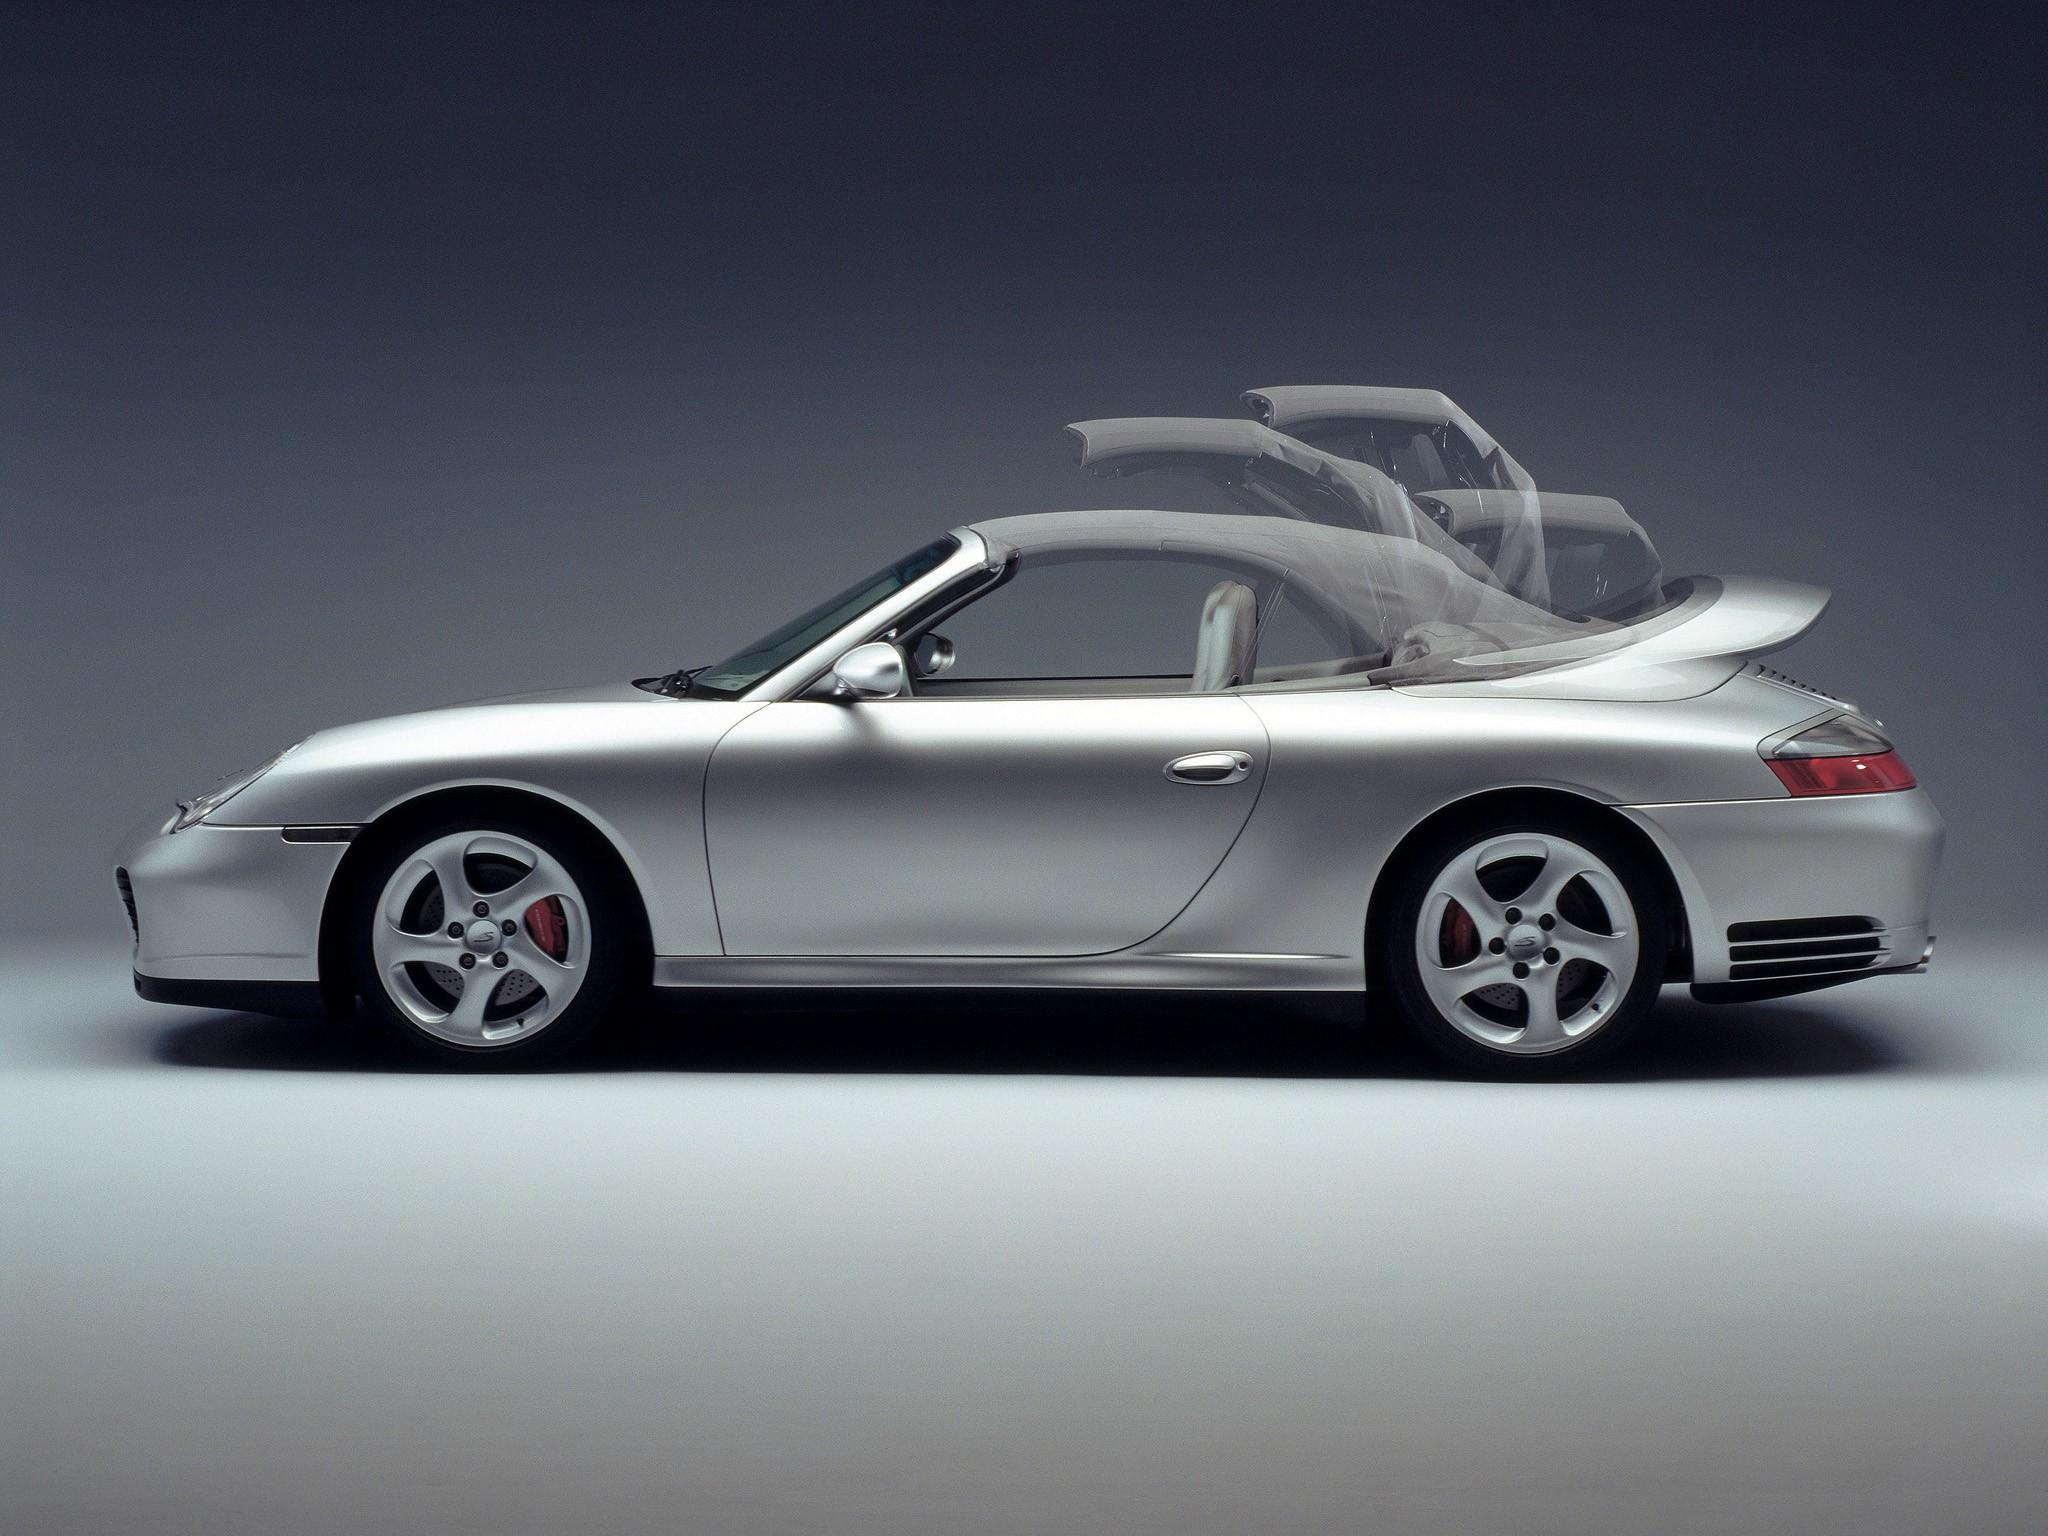 Porsche 911 Carrera 4s Cabriolet 996 Specs 2003 2004